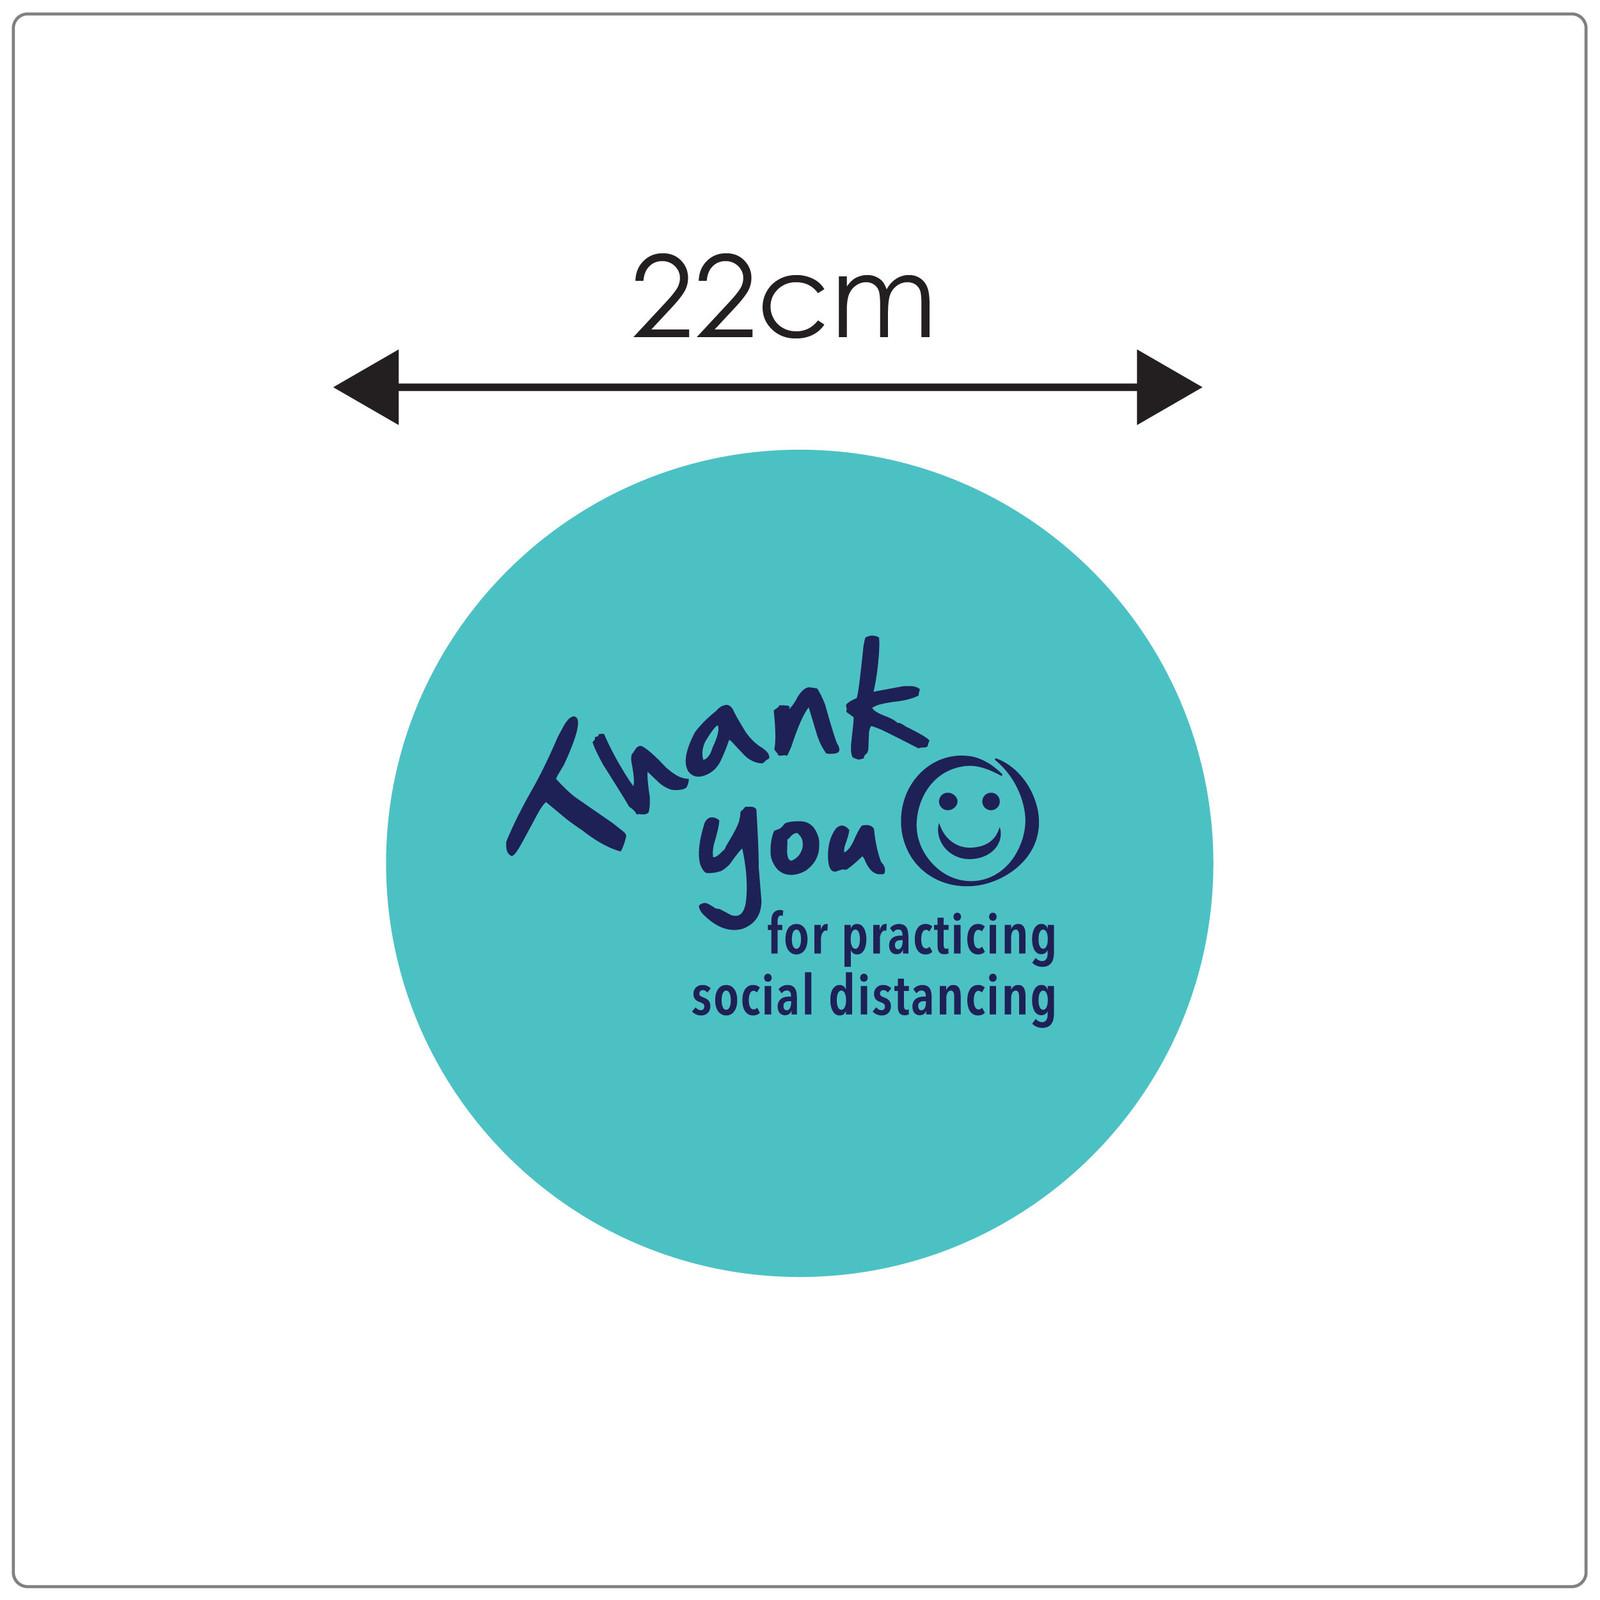 social distancing floor sticker for outdoor floors, teal, sizing Self-adhesive Corona virus floor sticker to help social distancing.